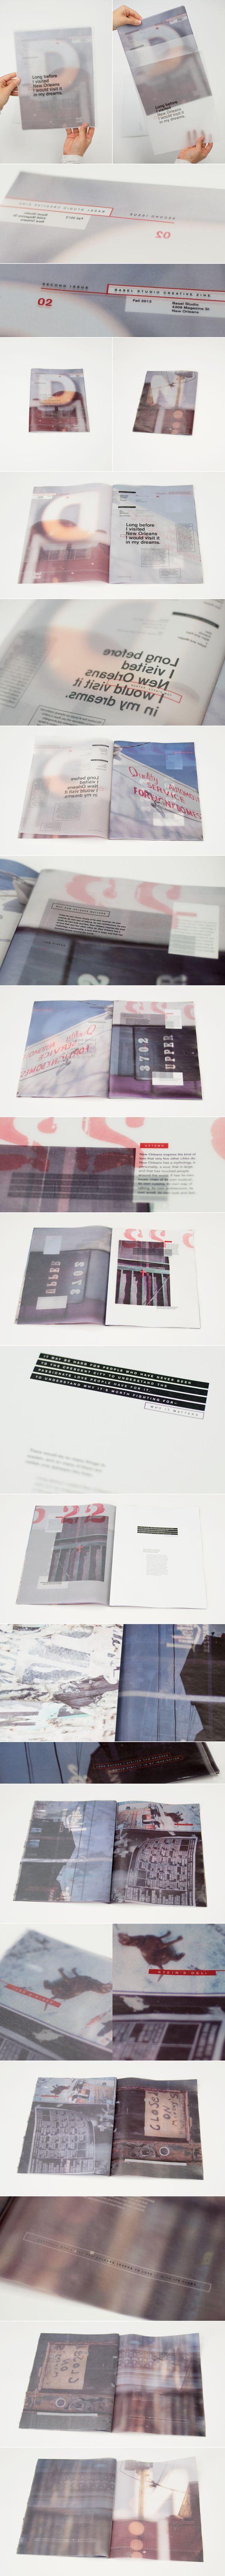 Basel Issue 02 by Liz Barnes, via Behance